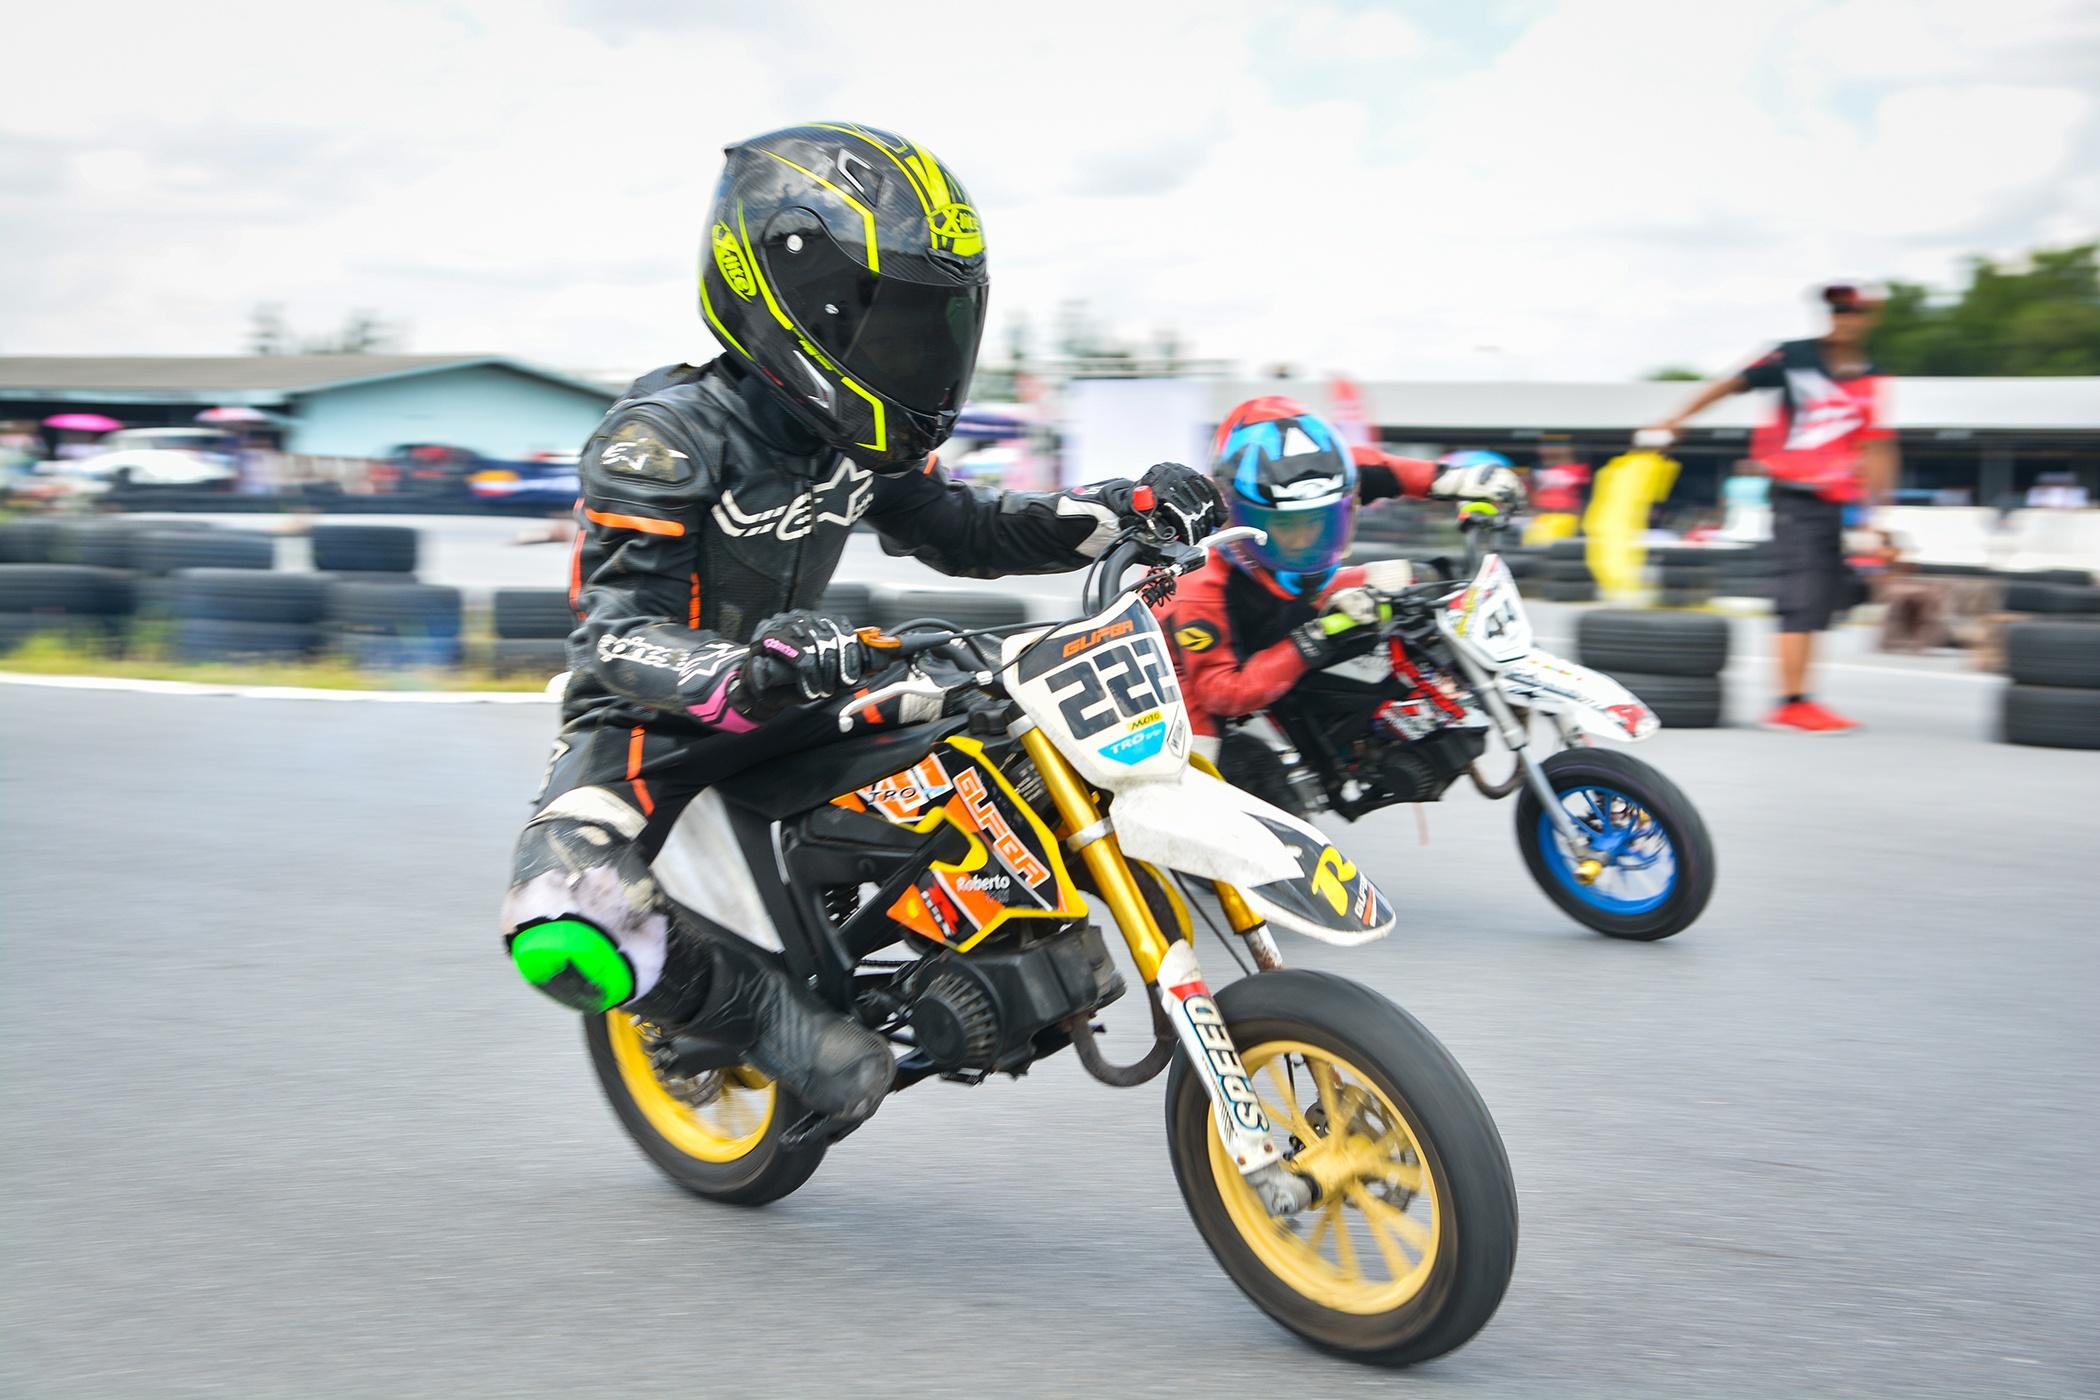 Giai dua moto tre em o Thai Lan va nhung giac mo MotoGP hinh anh 35